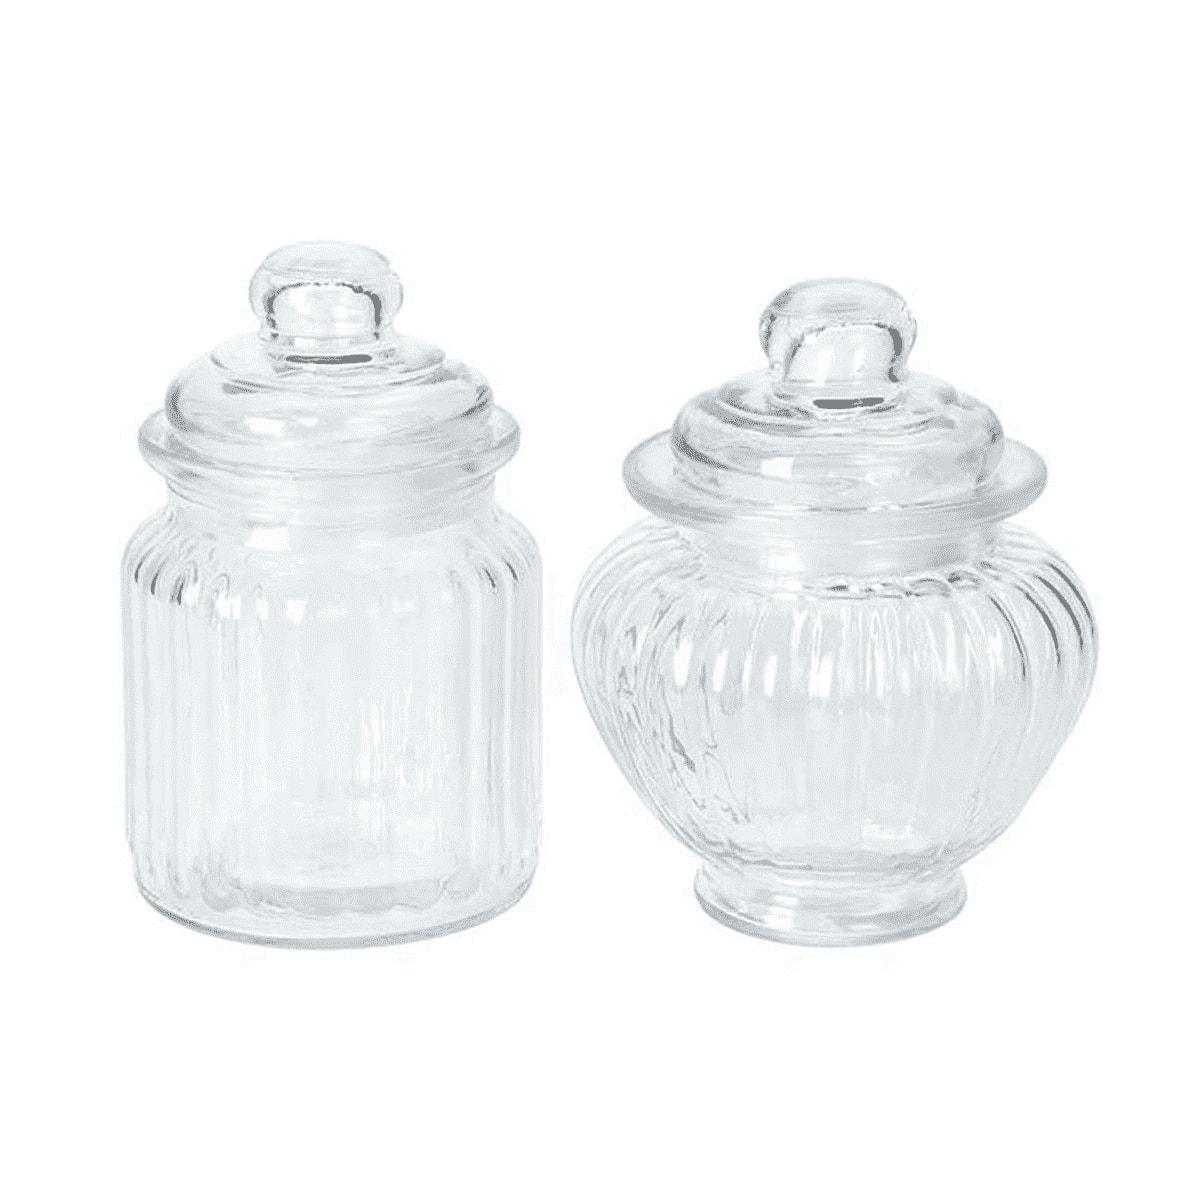 Set de 2 petites bonbonnières en verre classiques